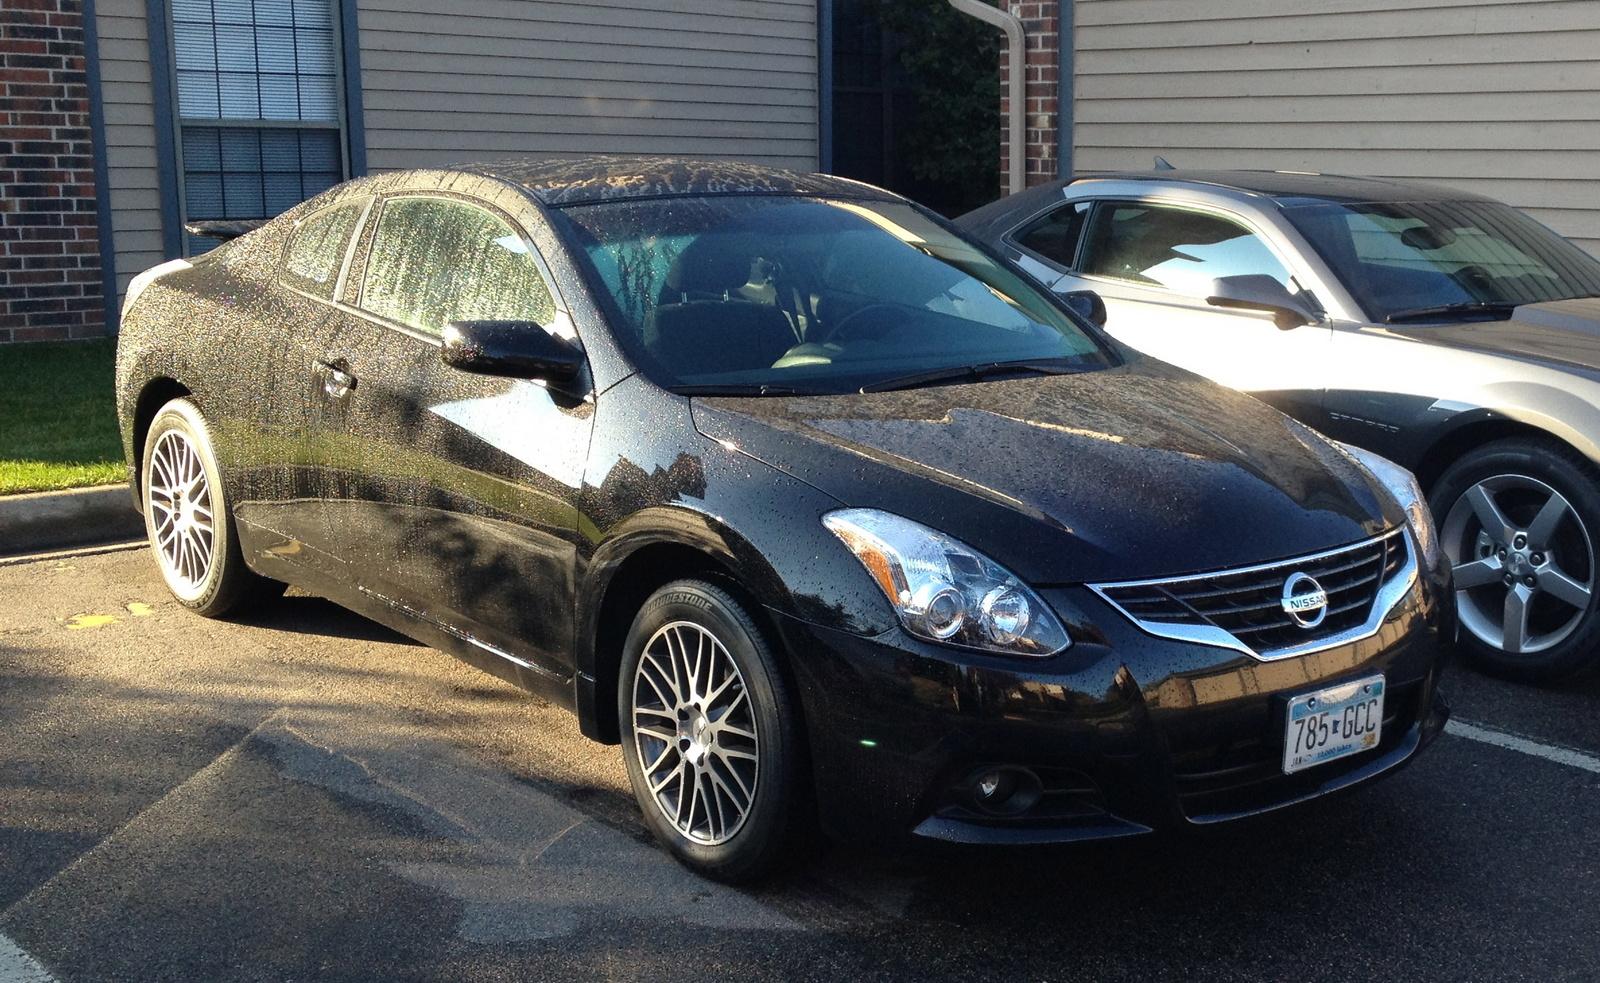 2011 Nissan Altima Coupe Pictures Cargurus